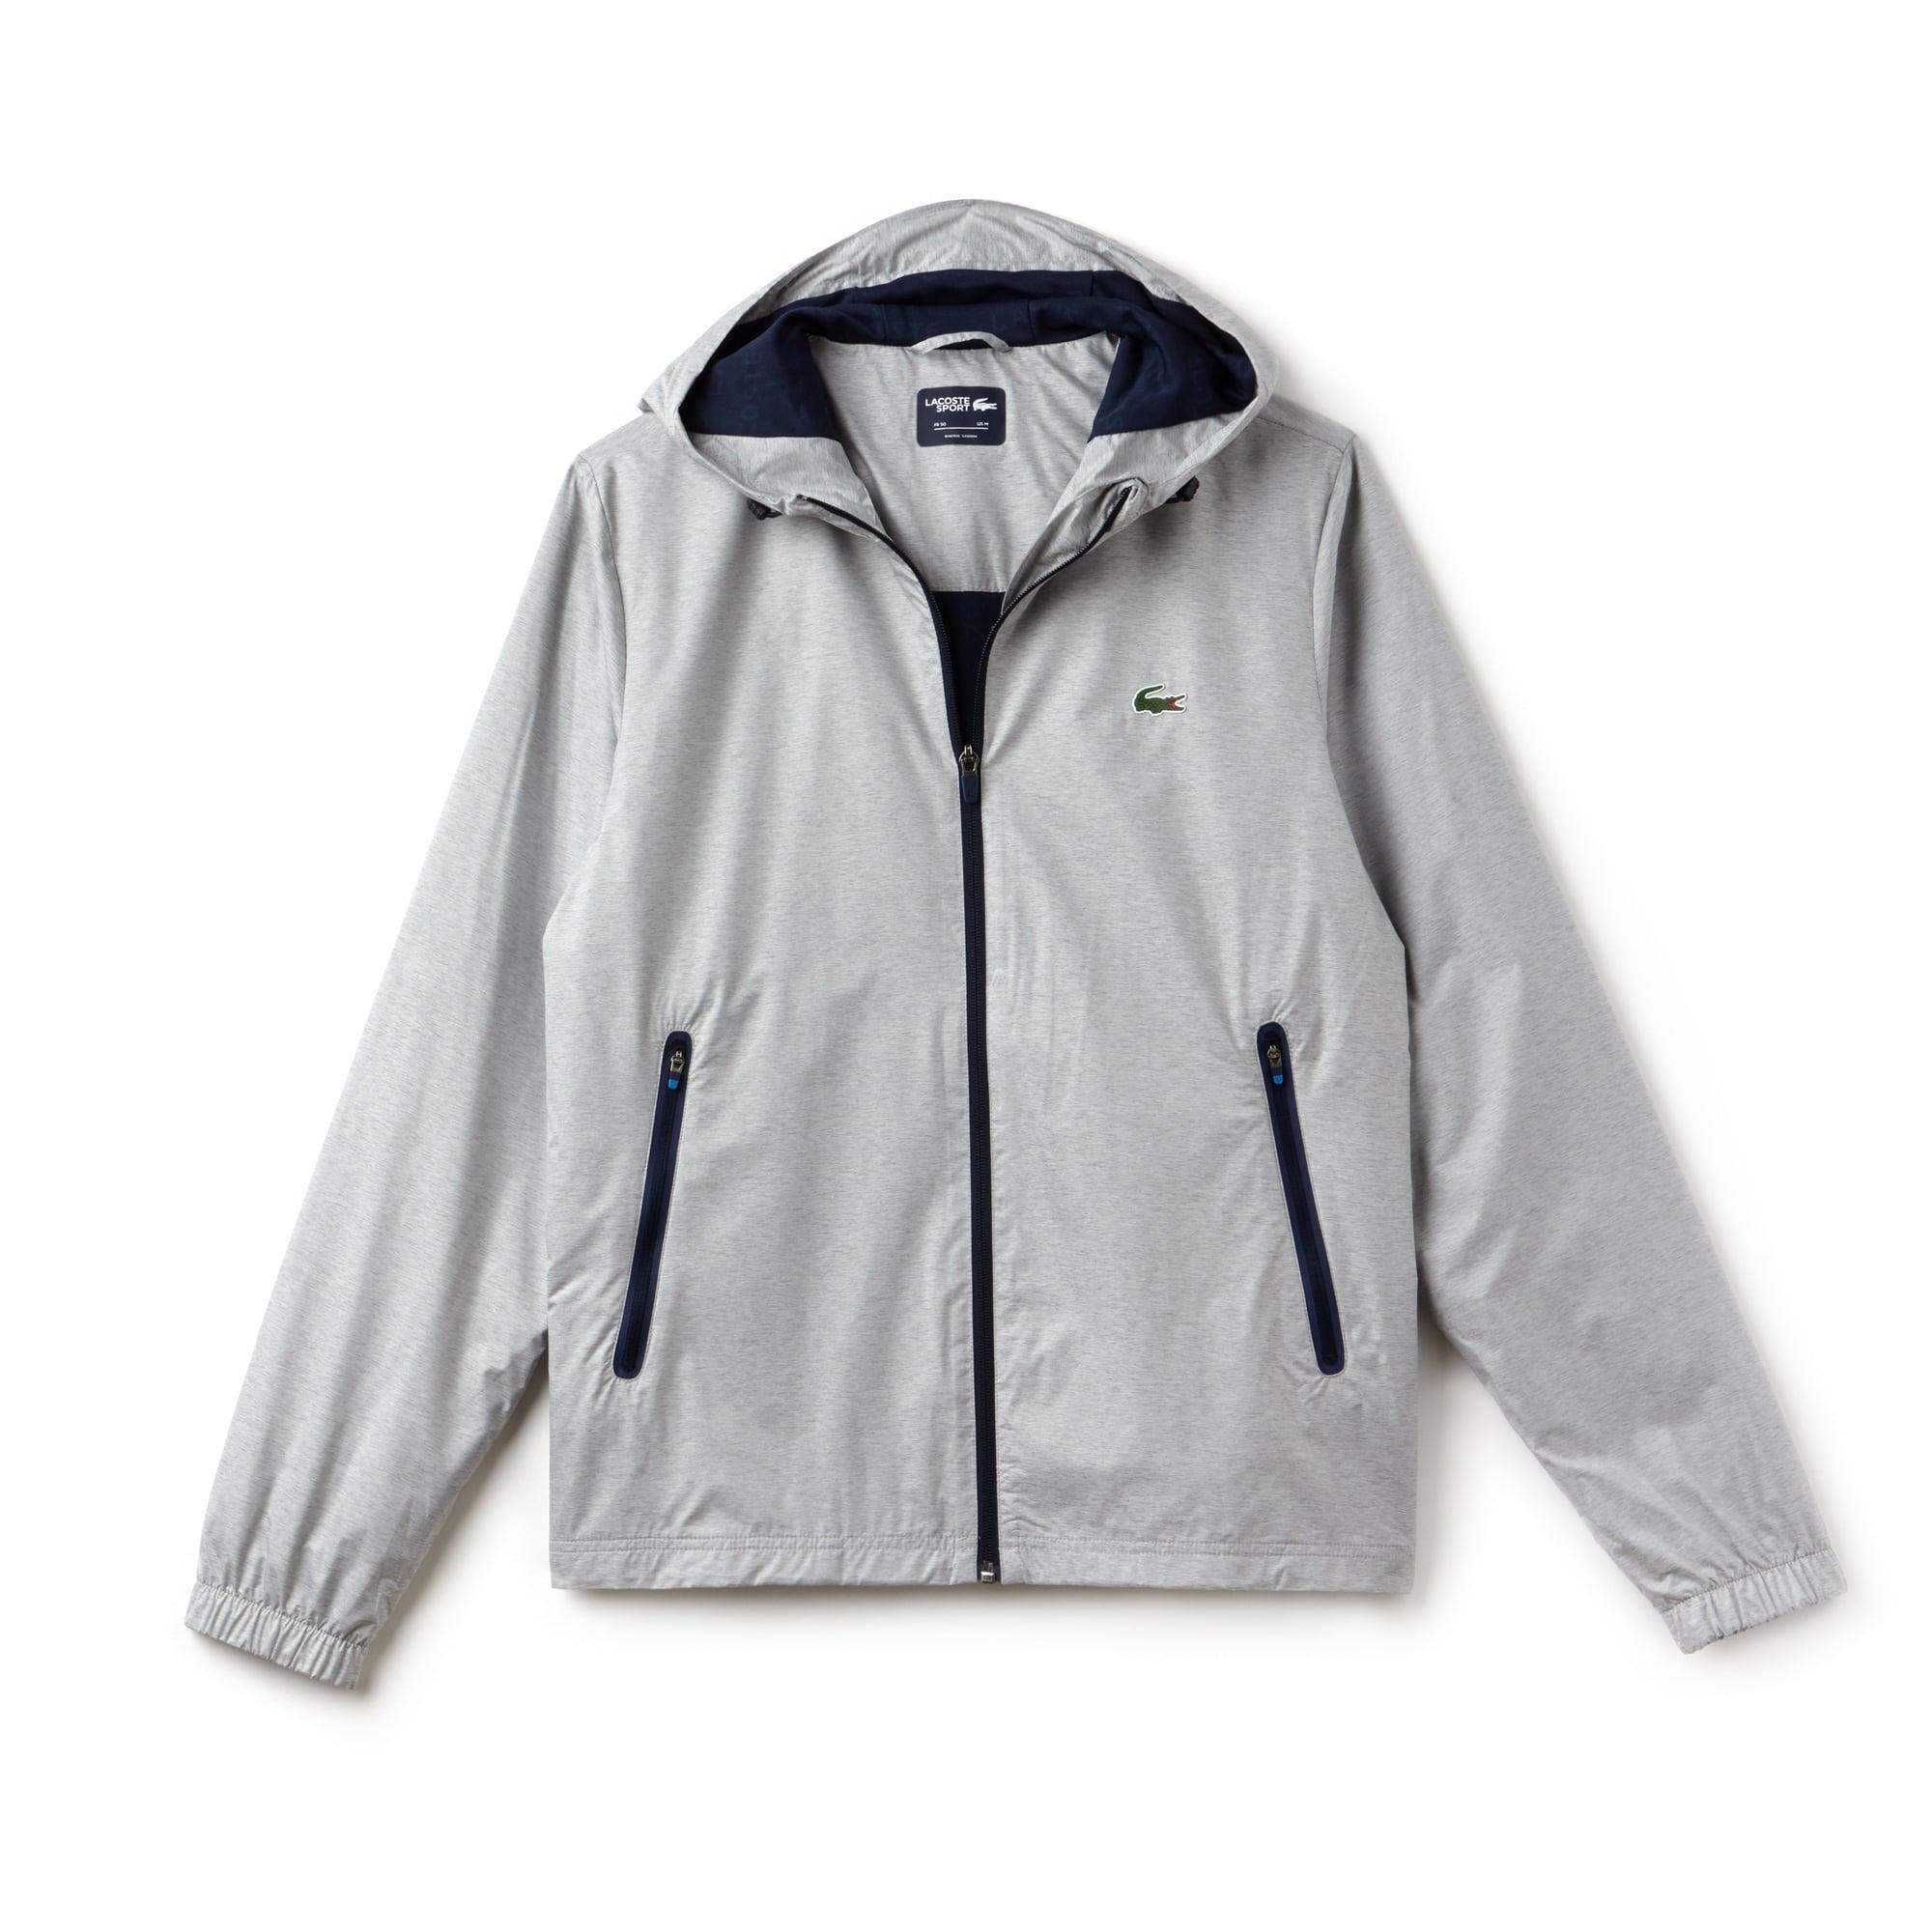 5c5b0dd60d988b ... Men s Lacoste SPORT Metallic Technical Taffeta Zip Golf Jacket